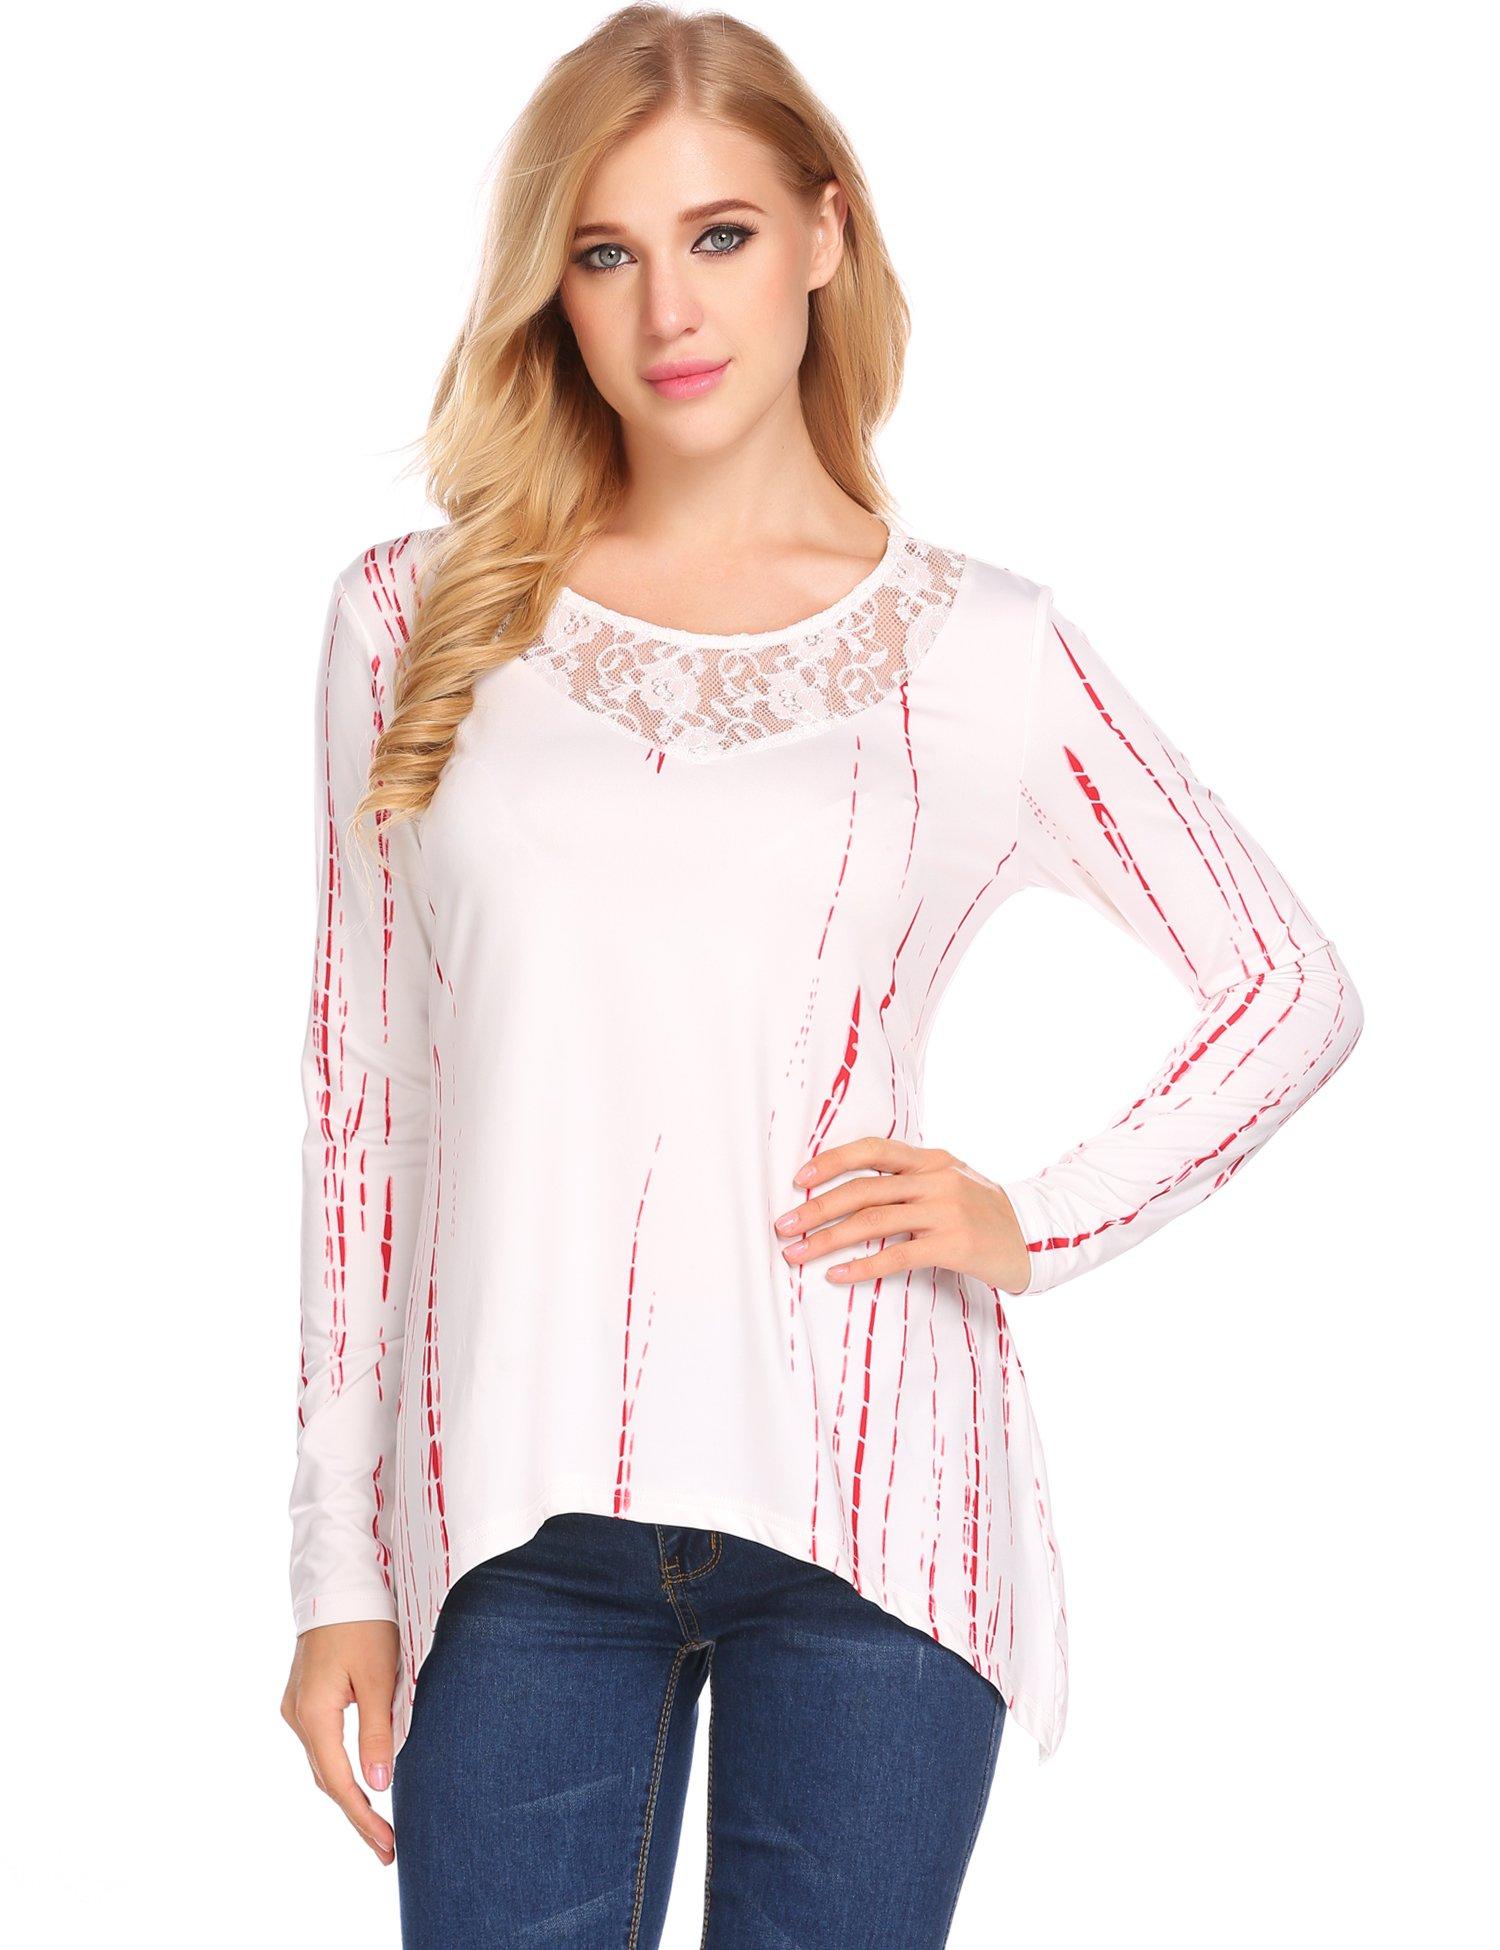 SummerRio Women's Long Sleeve Print Tunic Top Hollow Out Asymmetrical T-Shirt